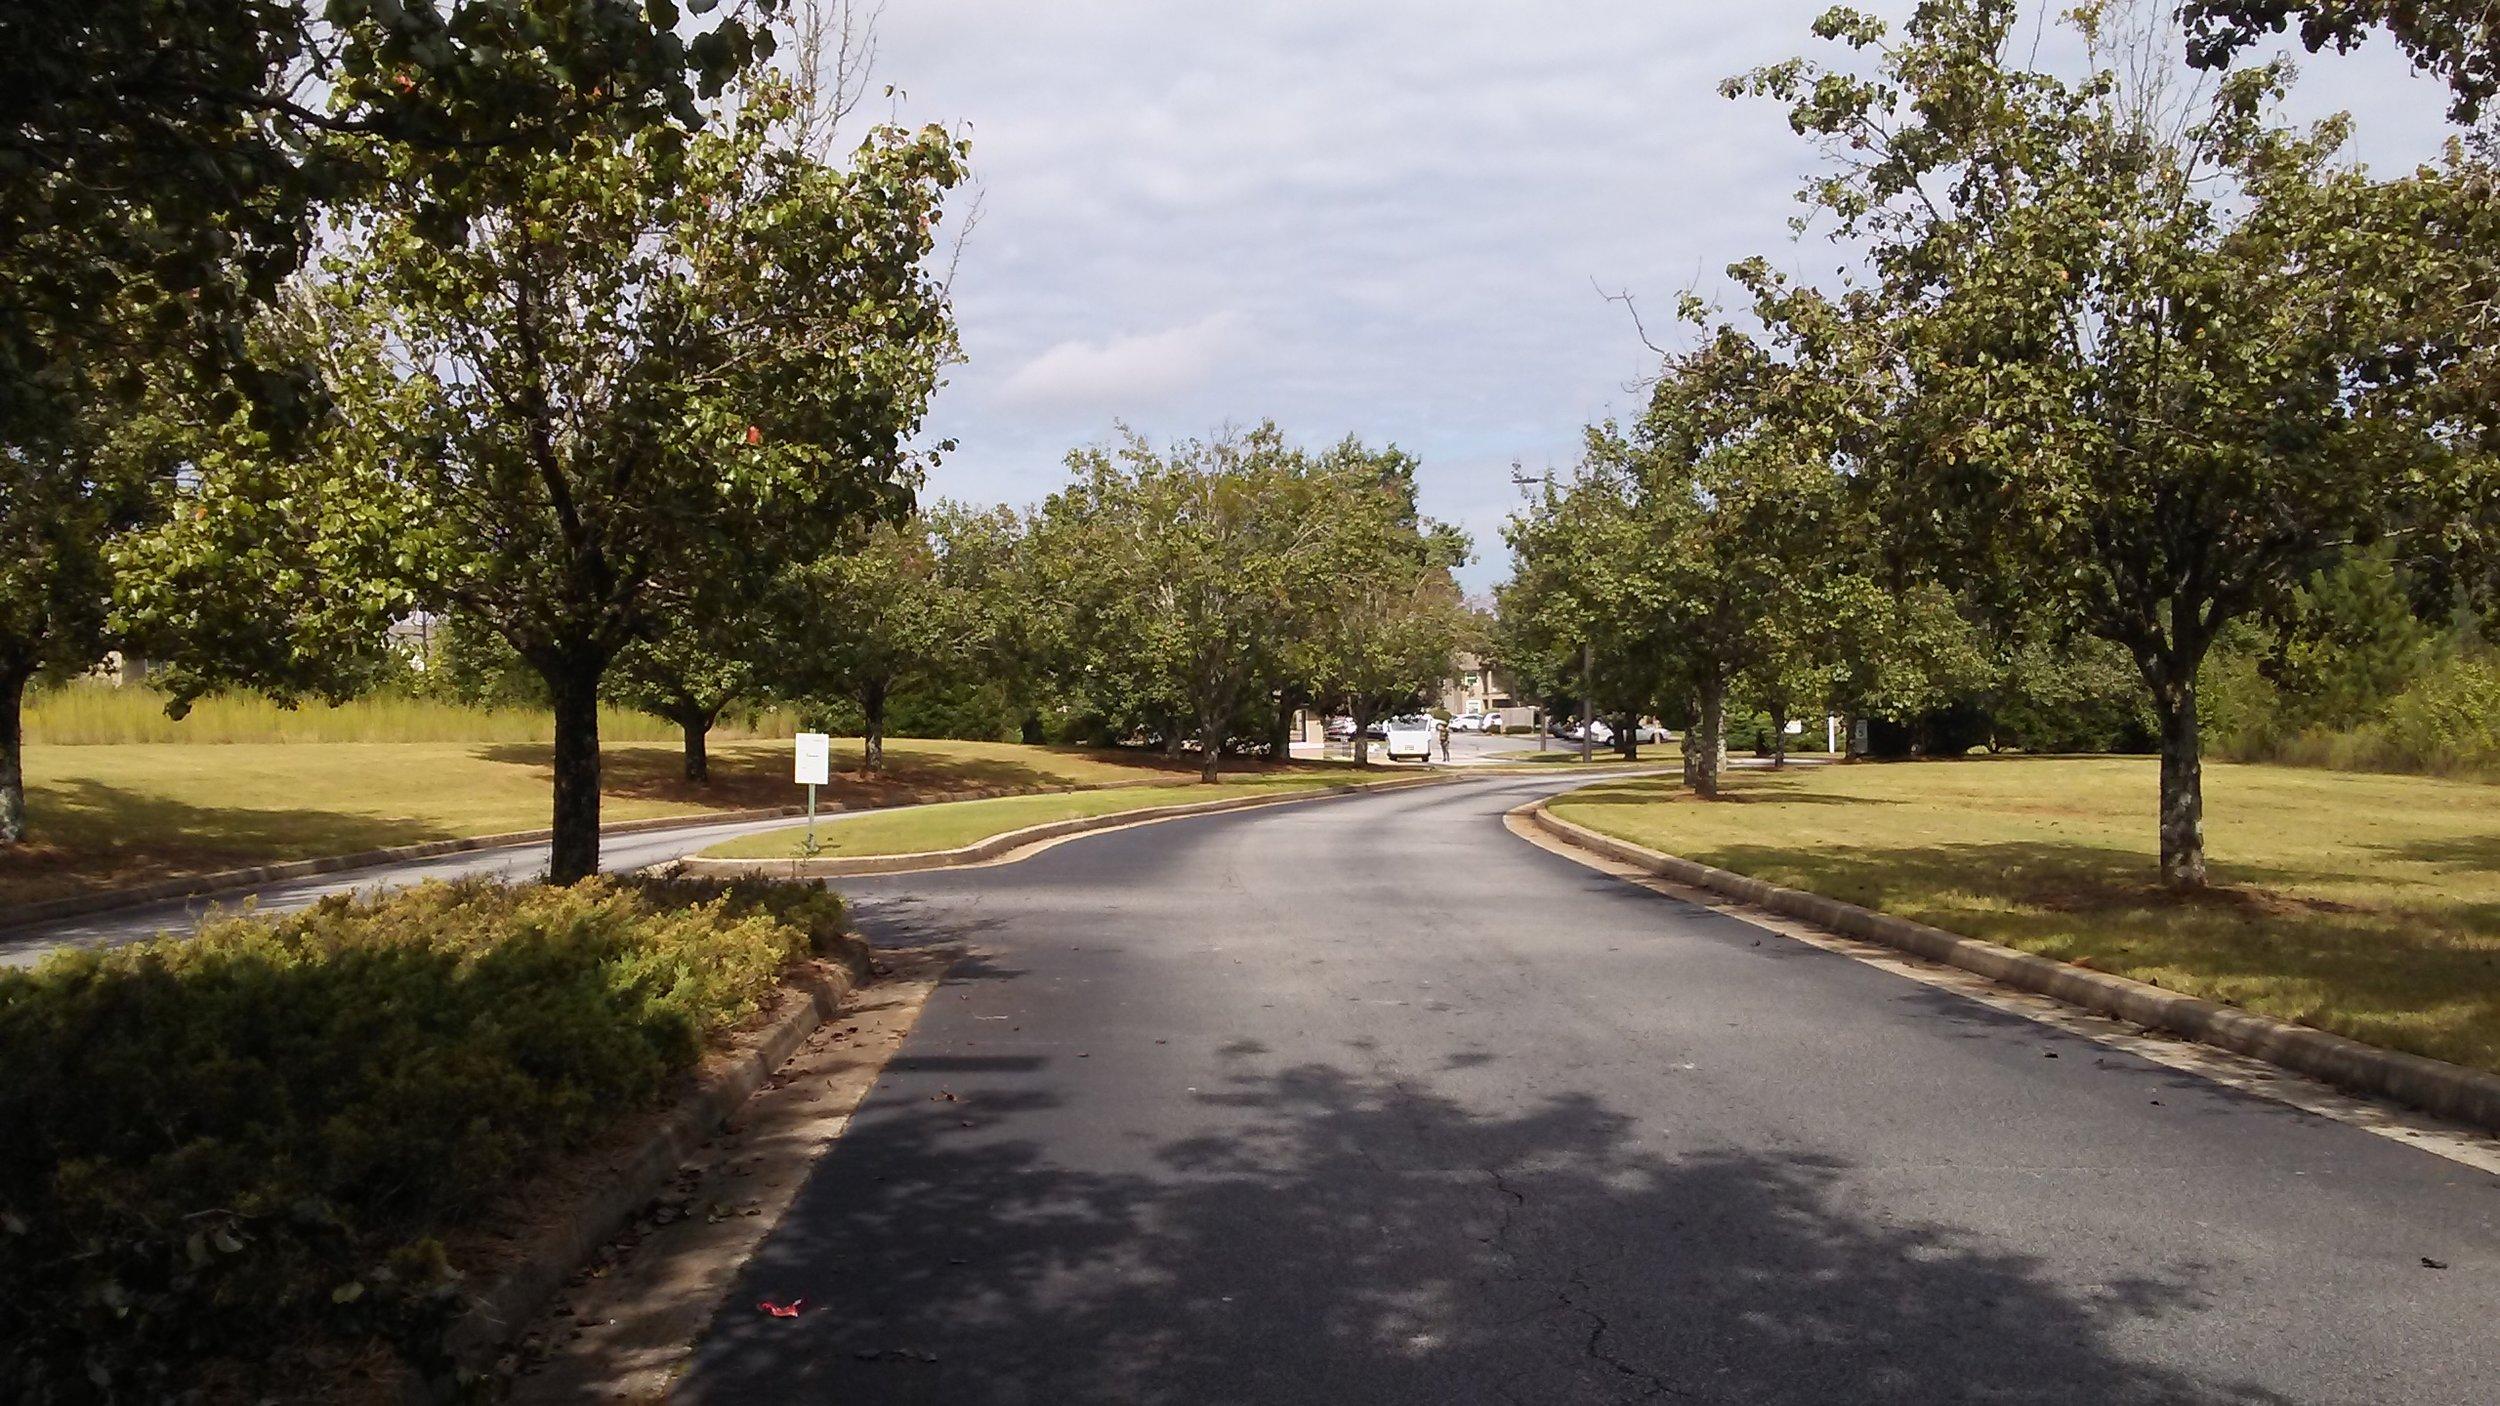 Sable Chase photos 9-29-18 038.jpg